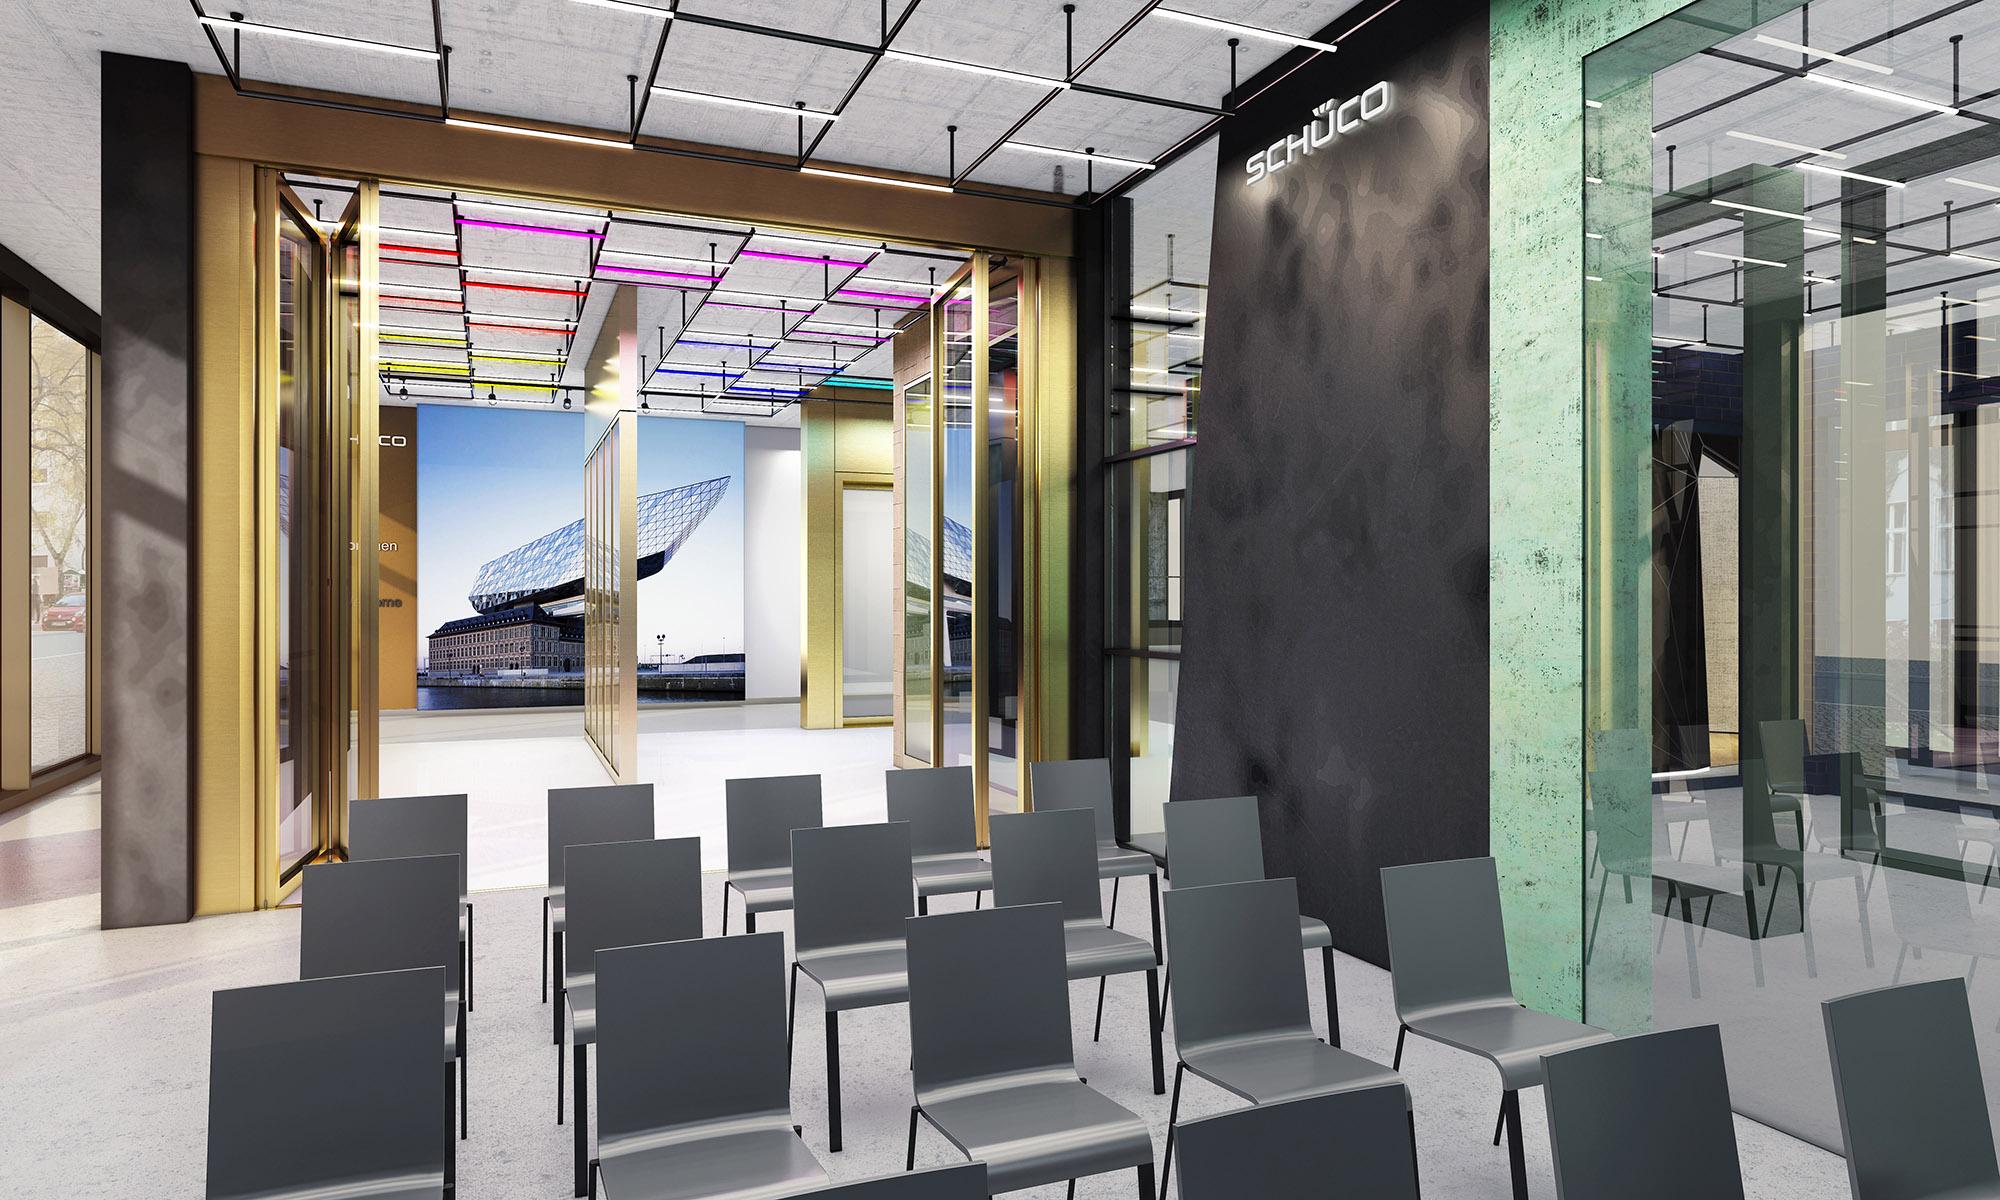 mojoimages architekturvisualisierung NordicOceanDesign Schueco Metropolitan Studio Berlin Seminar 2018